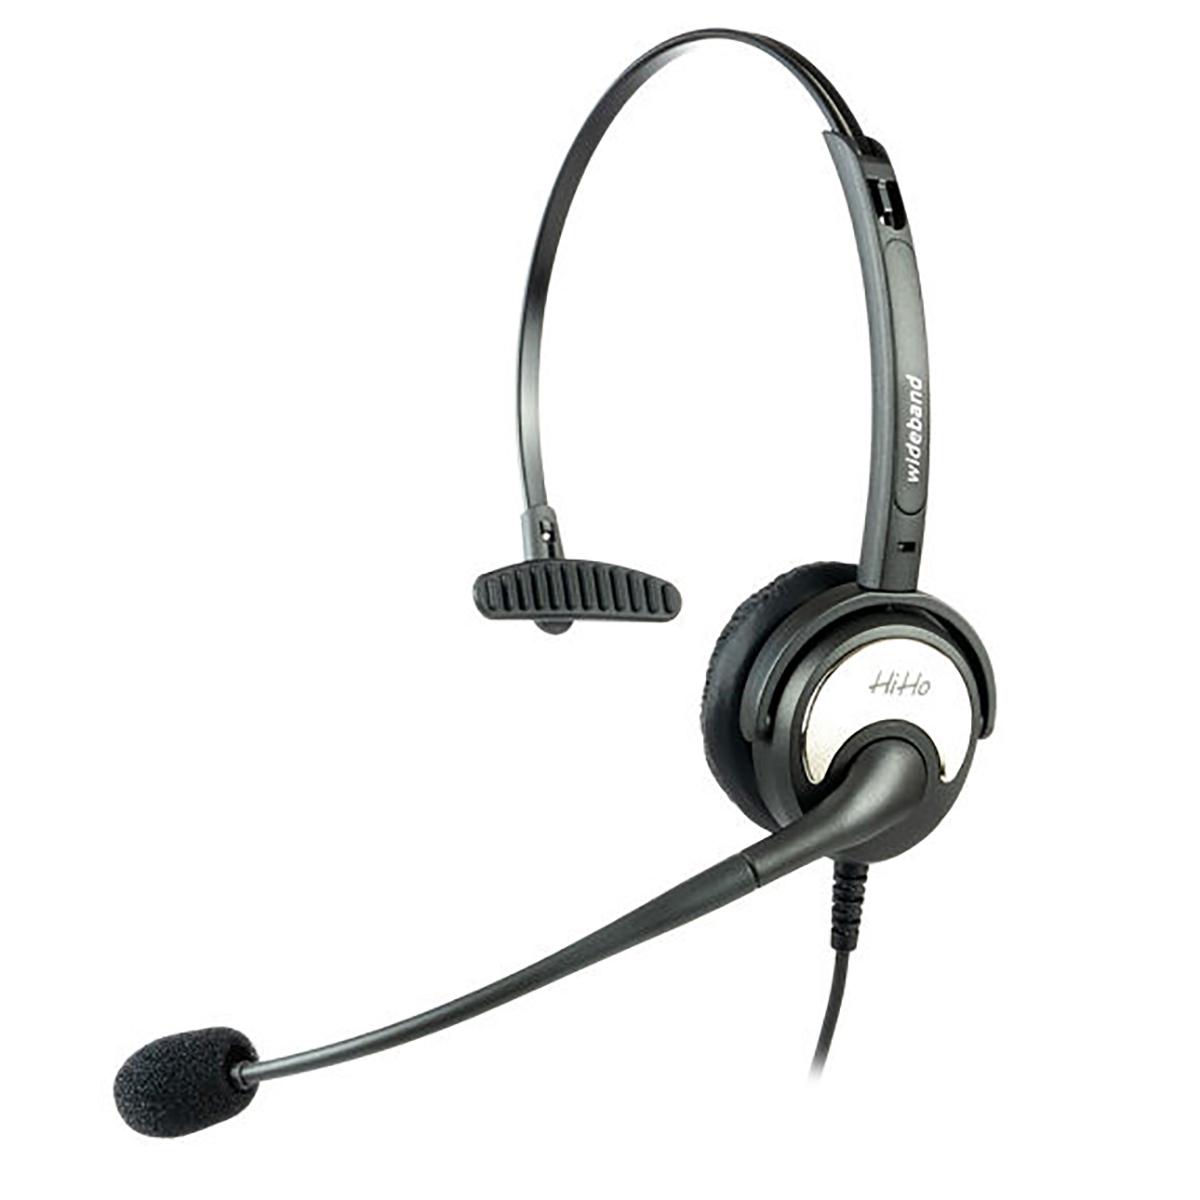 HiHo 100P Monaural QD Headset with Boom Mic